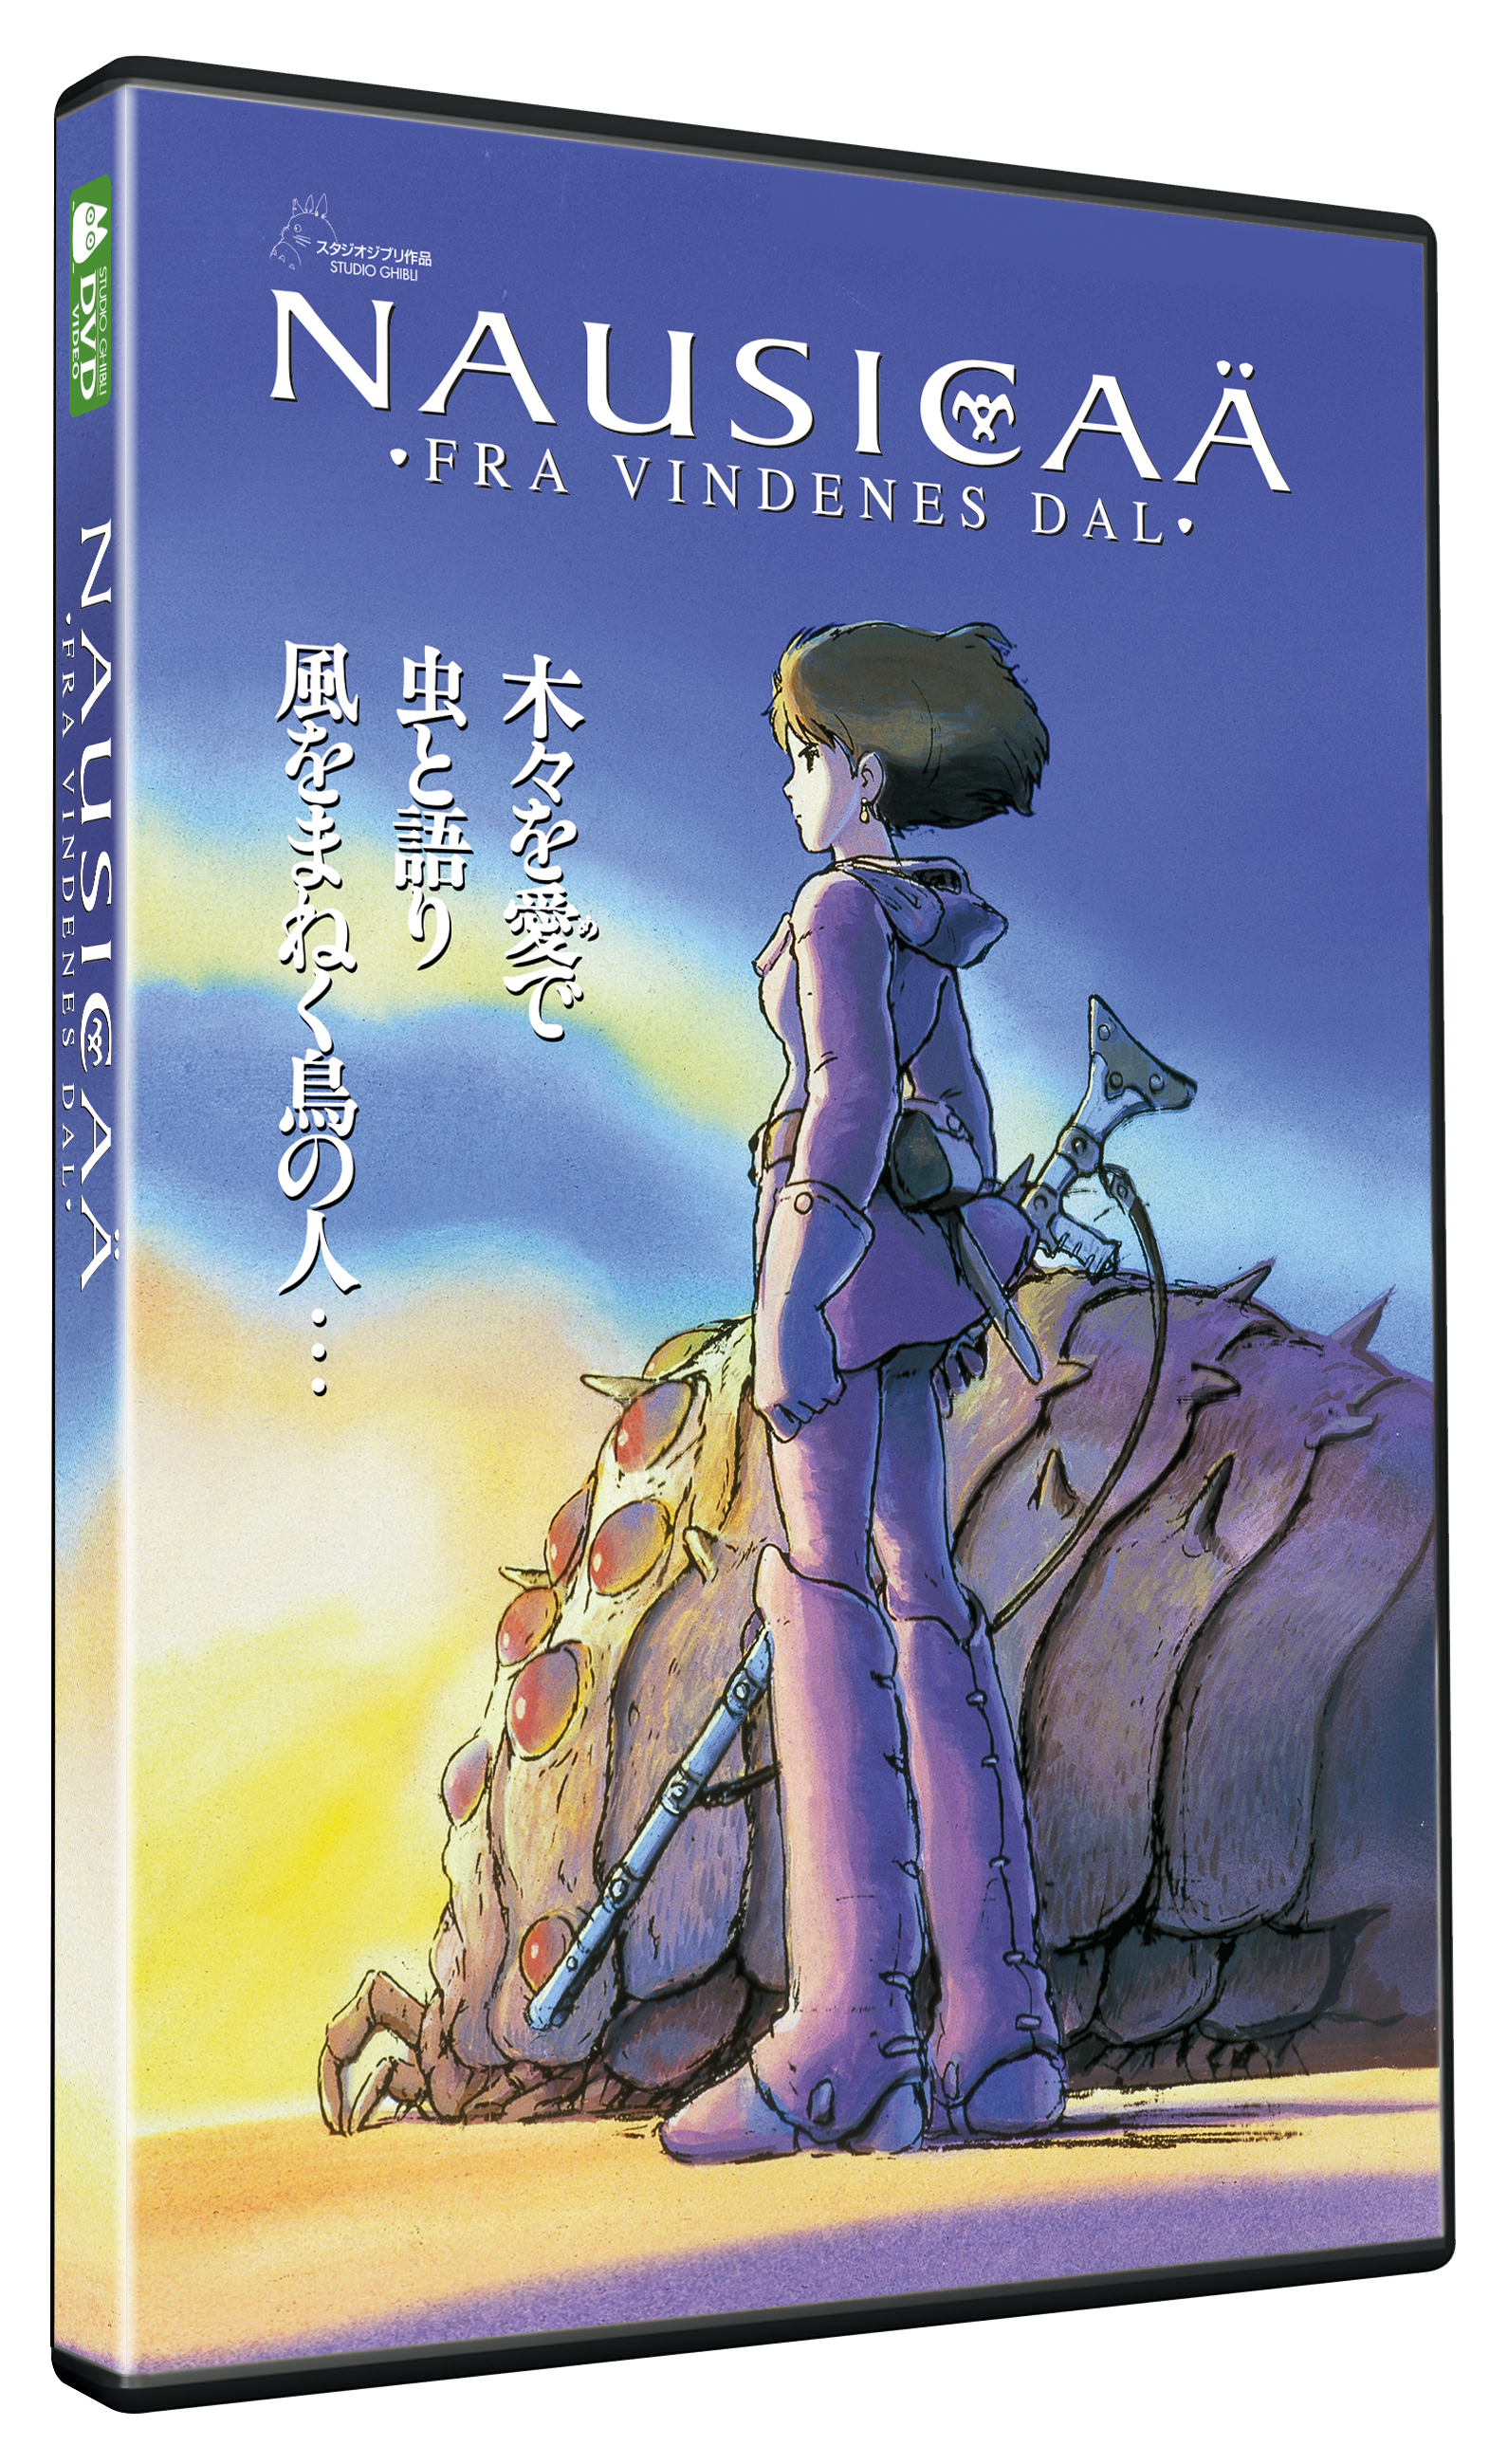 Nausicaä - fra vindenes dal - DVD (7072066043935)